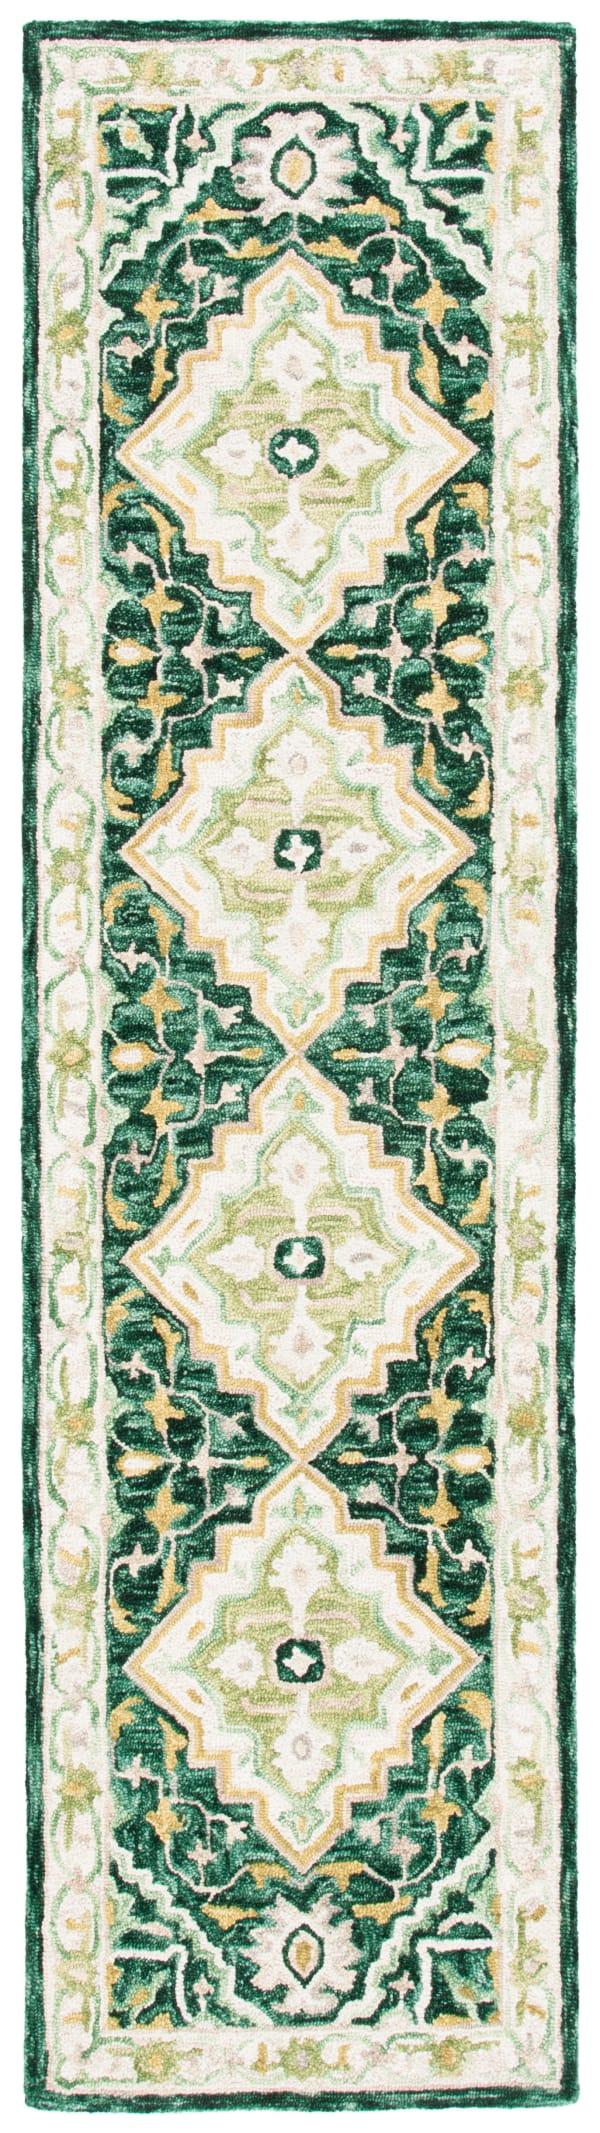 "Safavieh Vail 2'-3"" X 9' Green & Ivory Wool Rug"